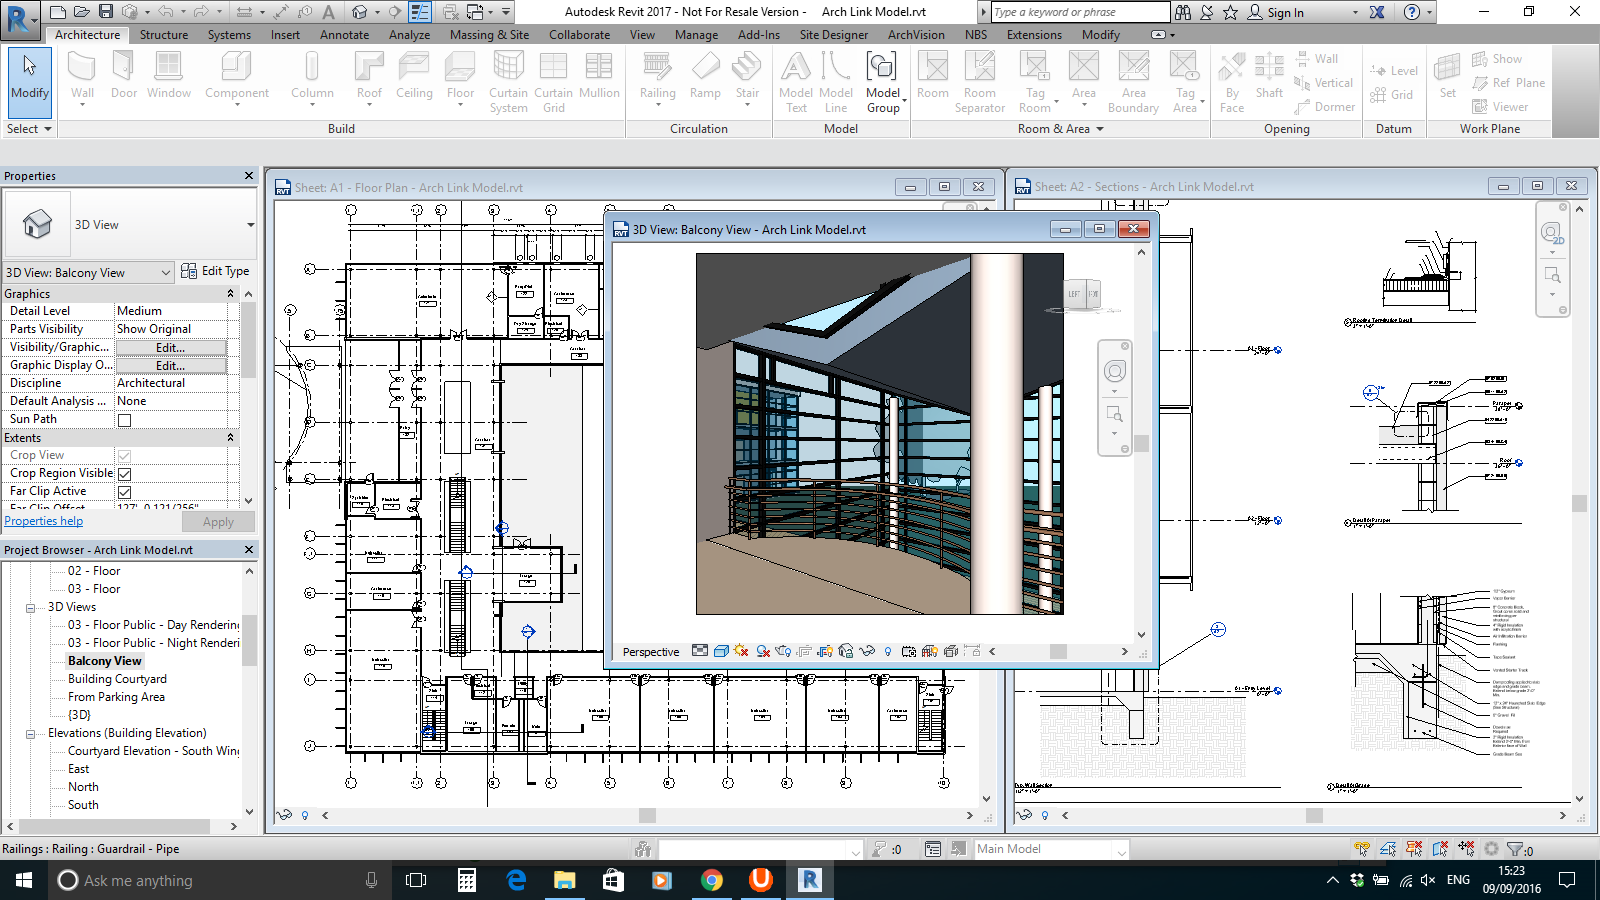 revit essentials for building design course west sussex revit architecture example